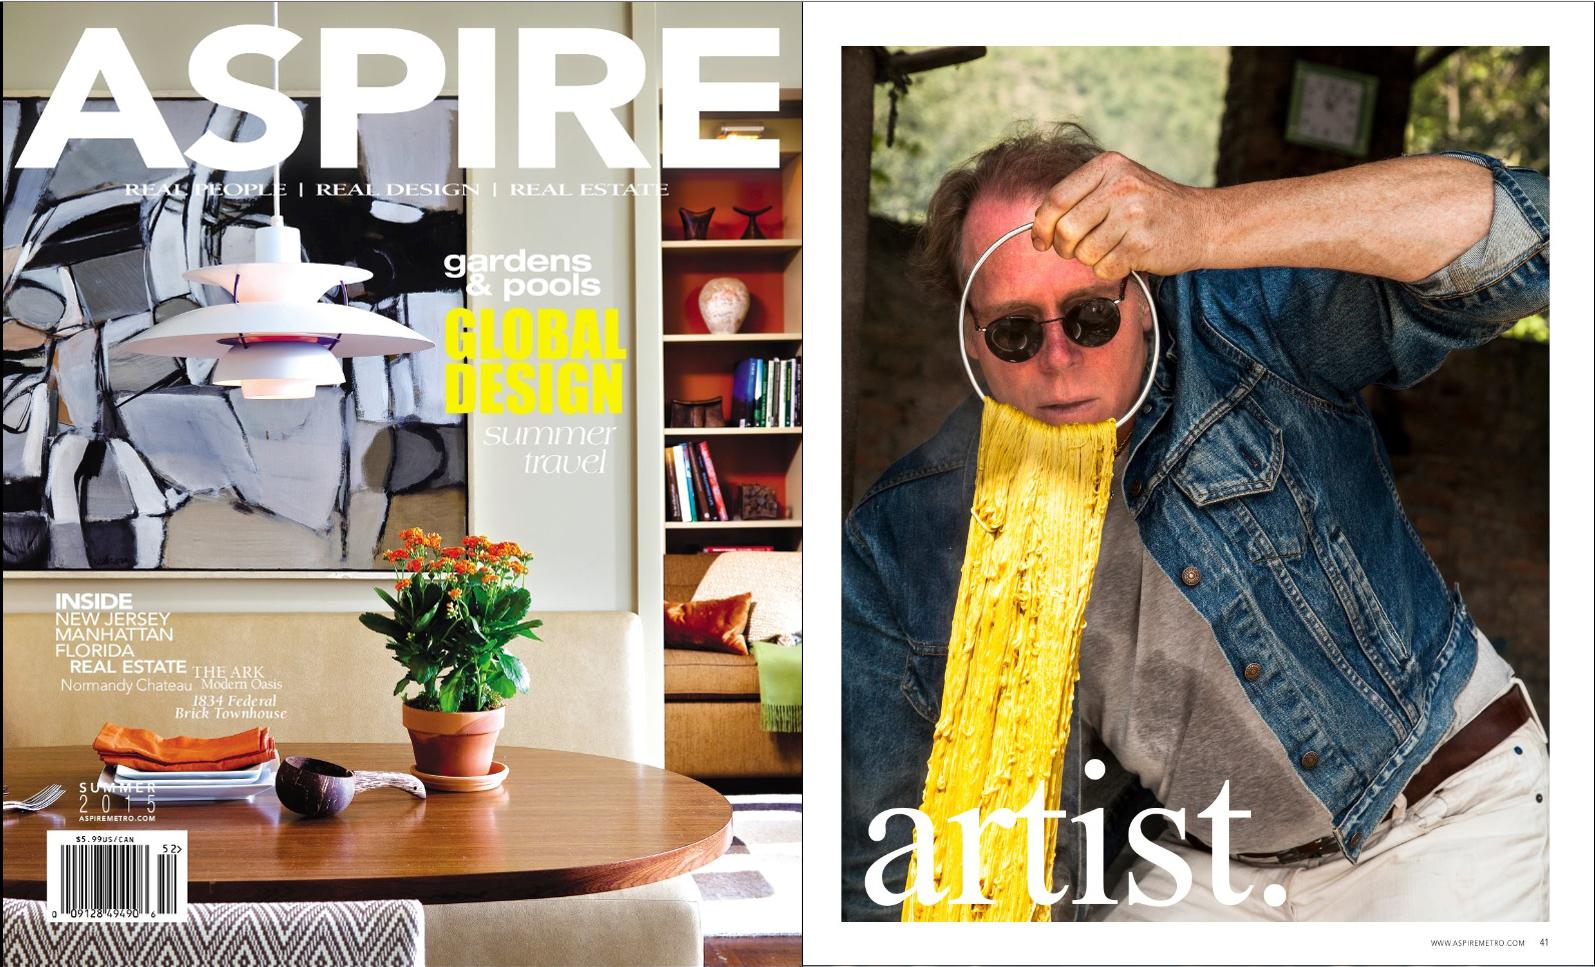 Aspire Magazine Press_Website image.jpg